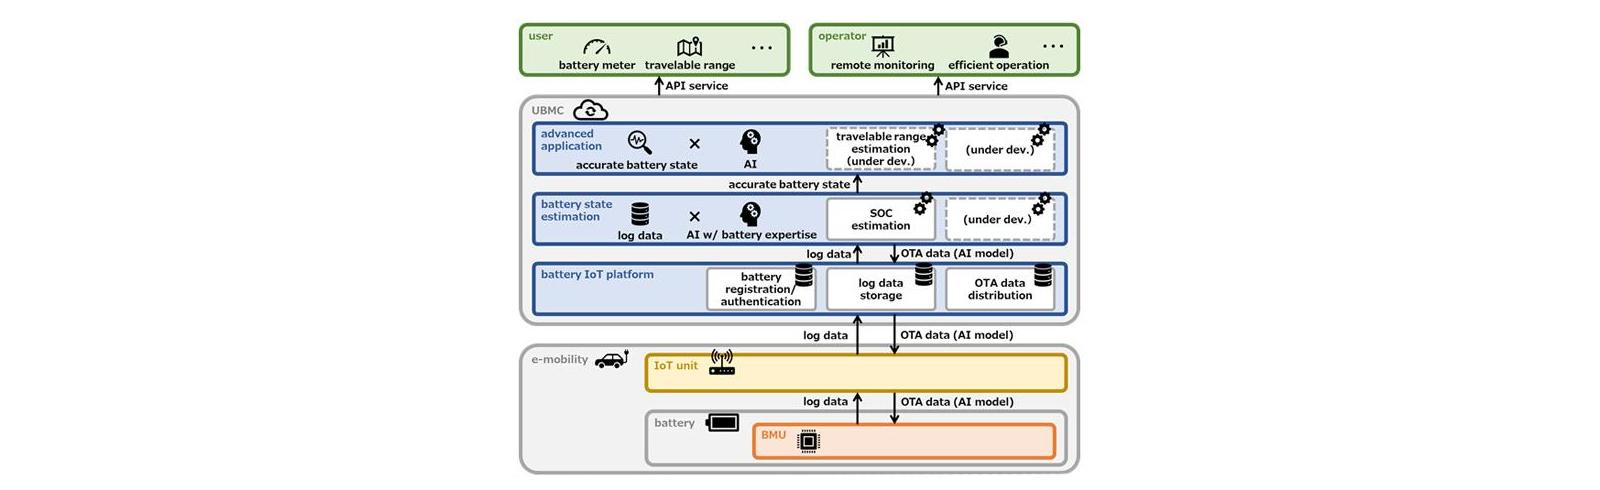 Panasonic has developed a cloud-based battery management service